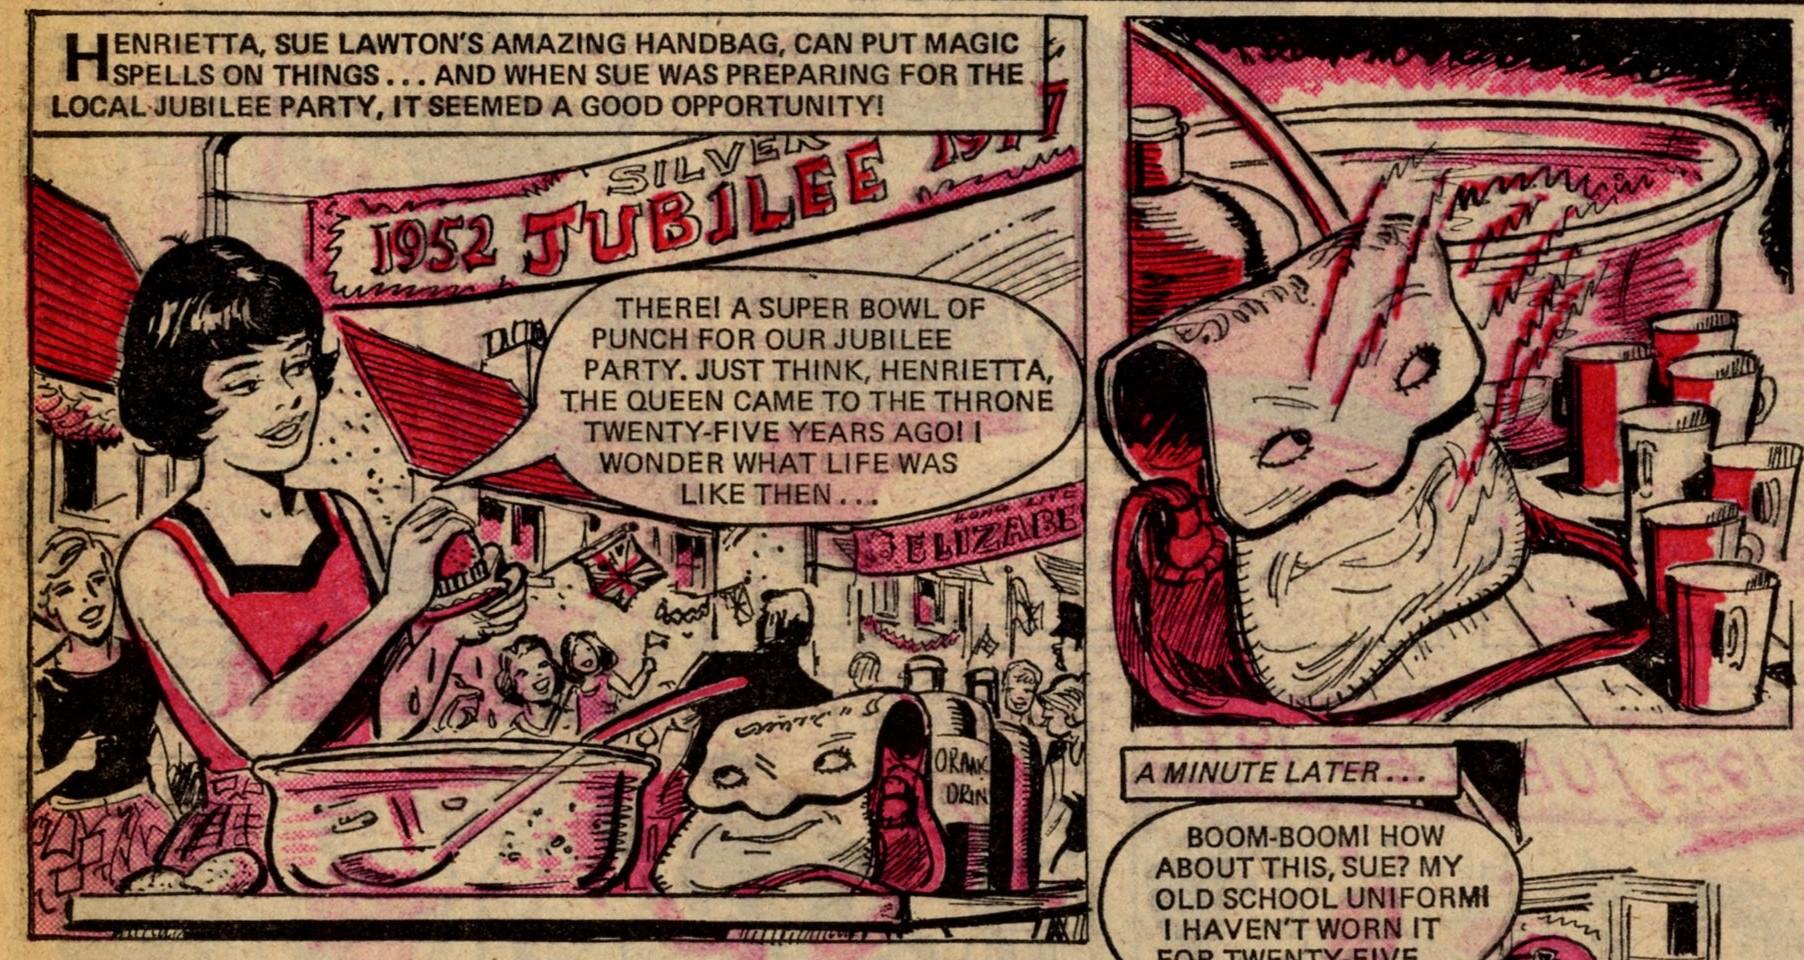 Sue's Fantastic Funbag: Hugh Thornton Jones (artist)